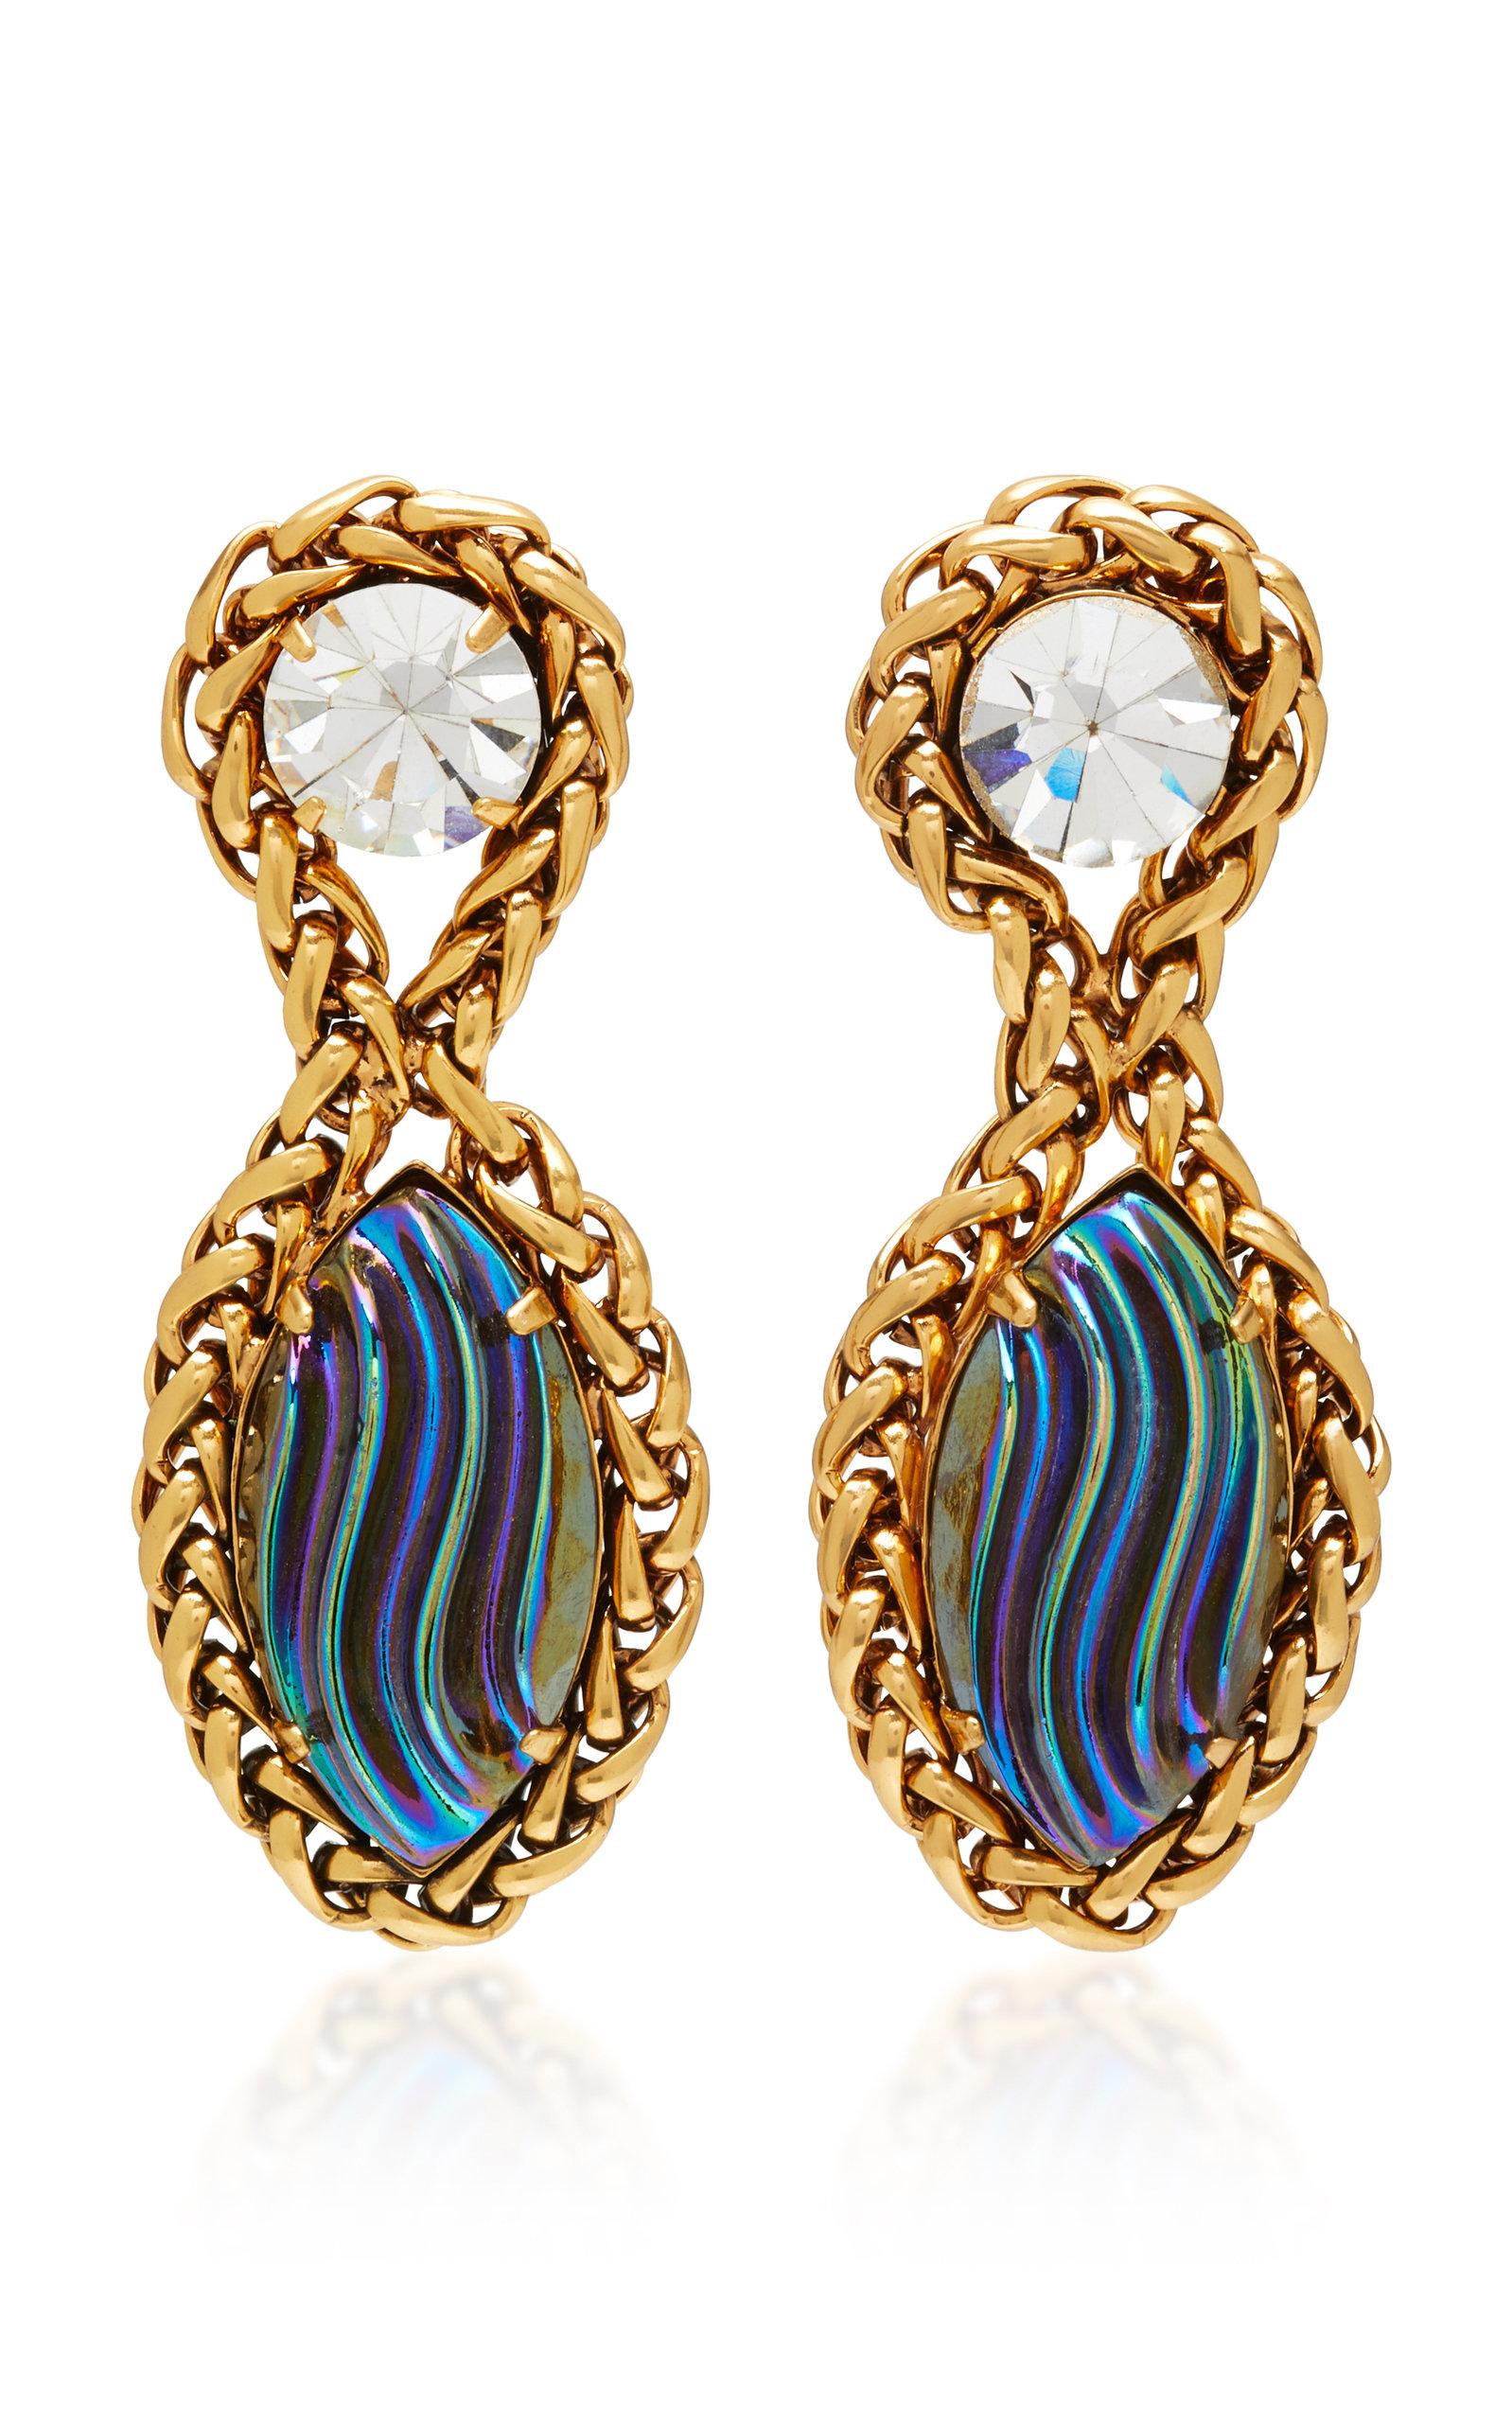 Palmer 18K Gold-Plated Crystal Earrings Nicole Romano OKMU6T